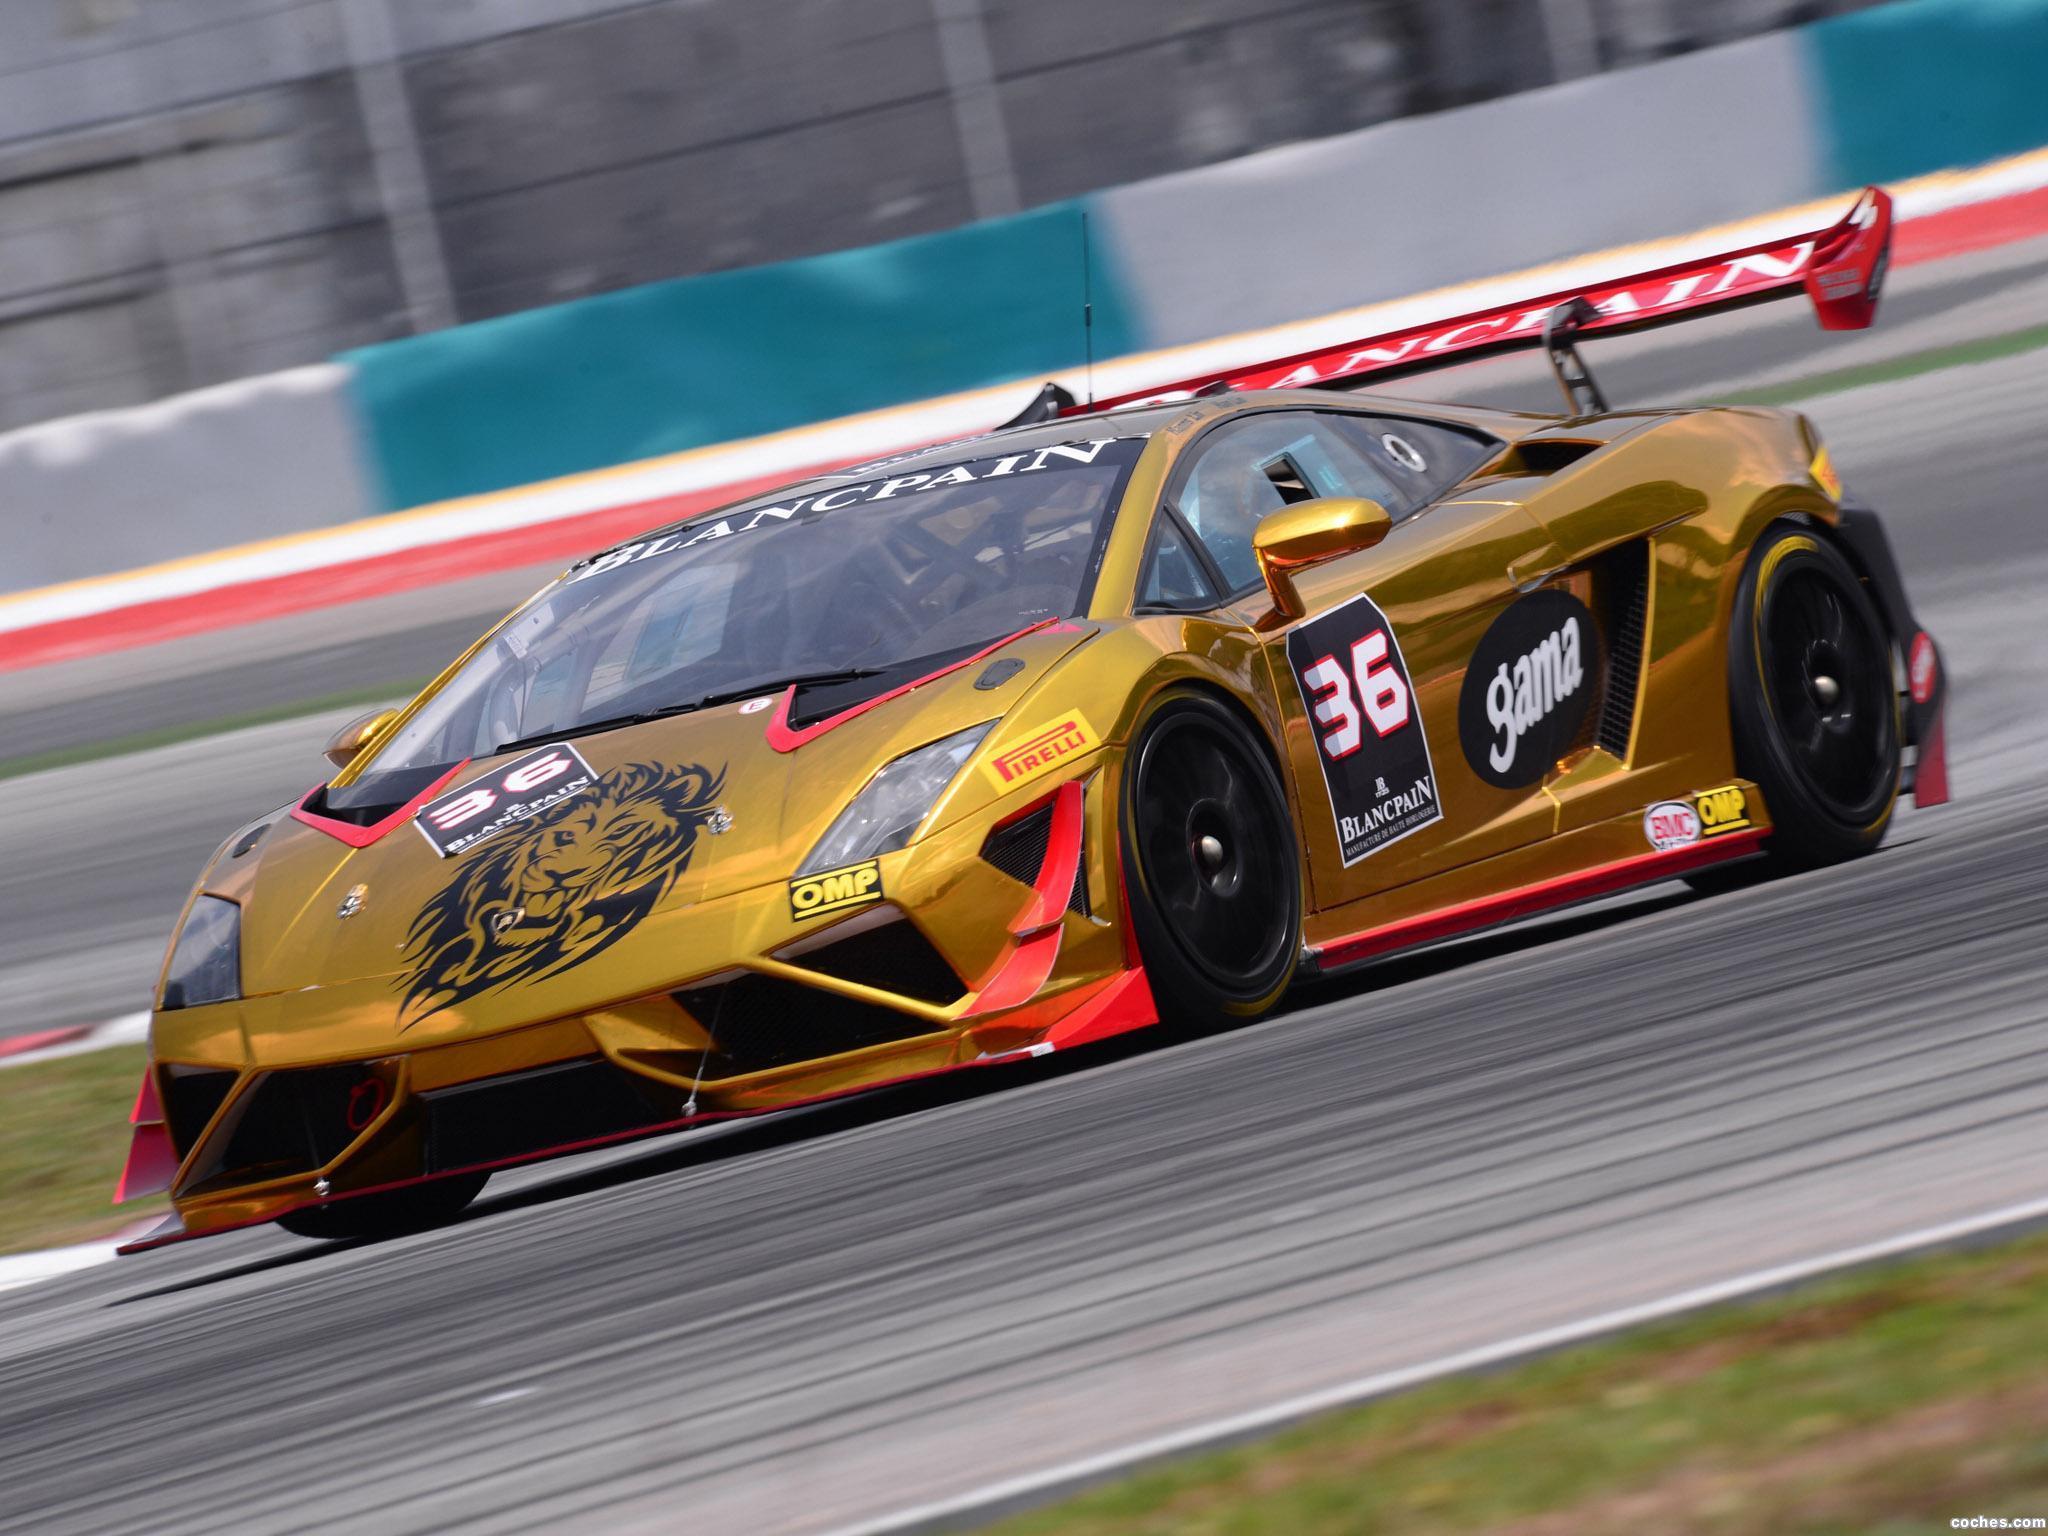 Foto 0 de Lamborghini Gallardo LP570-4 Super Trofeo 2013